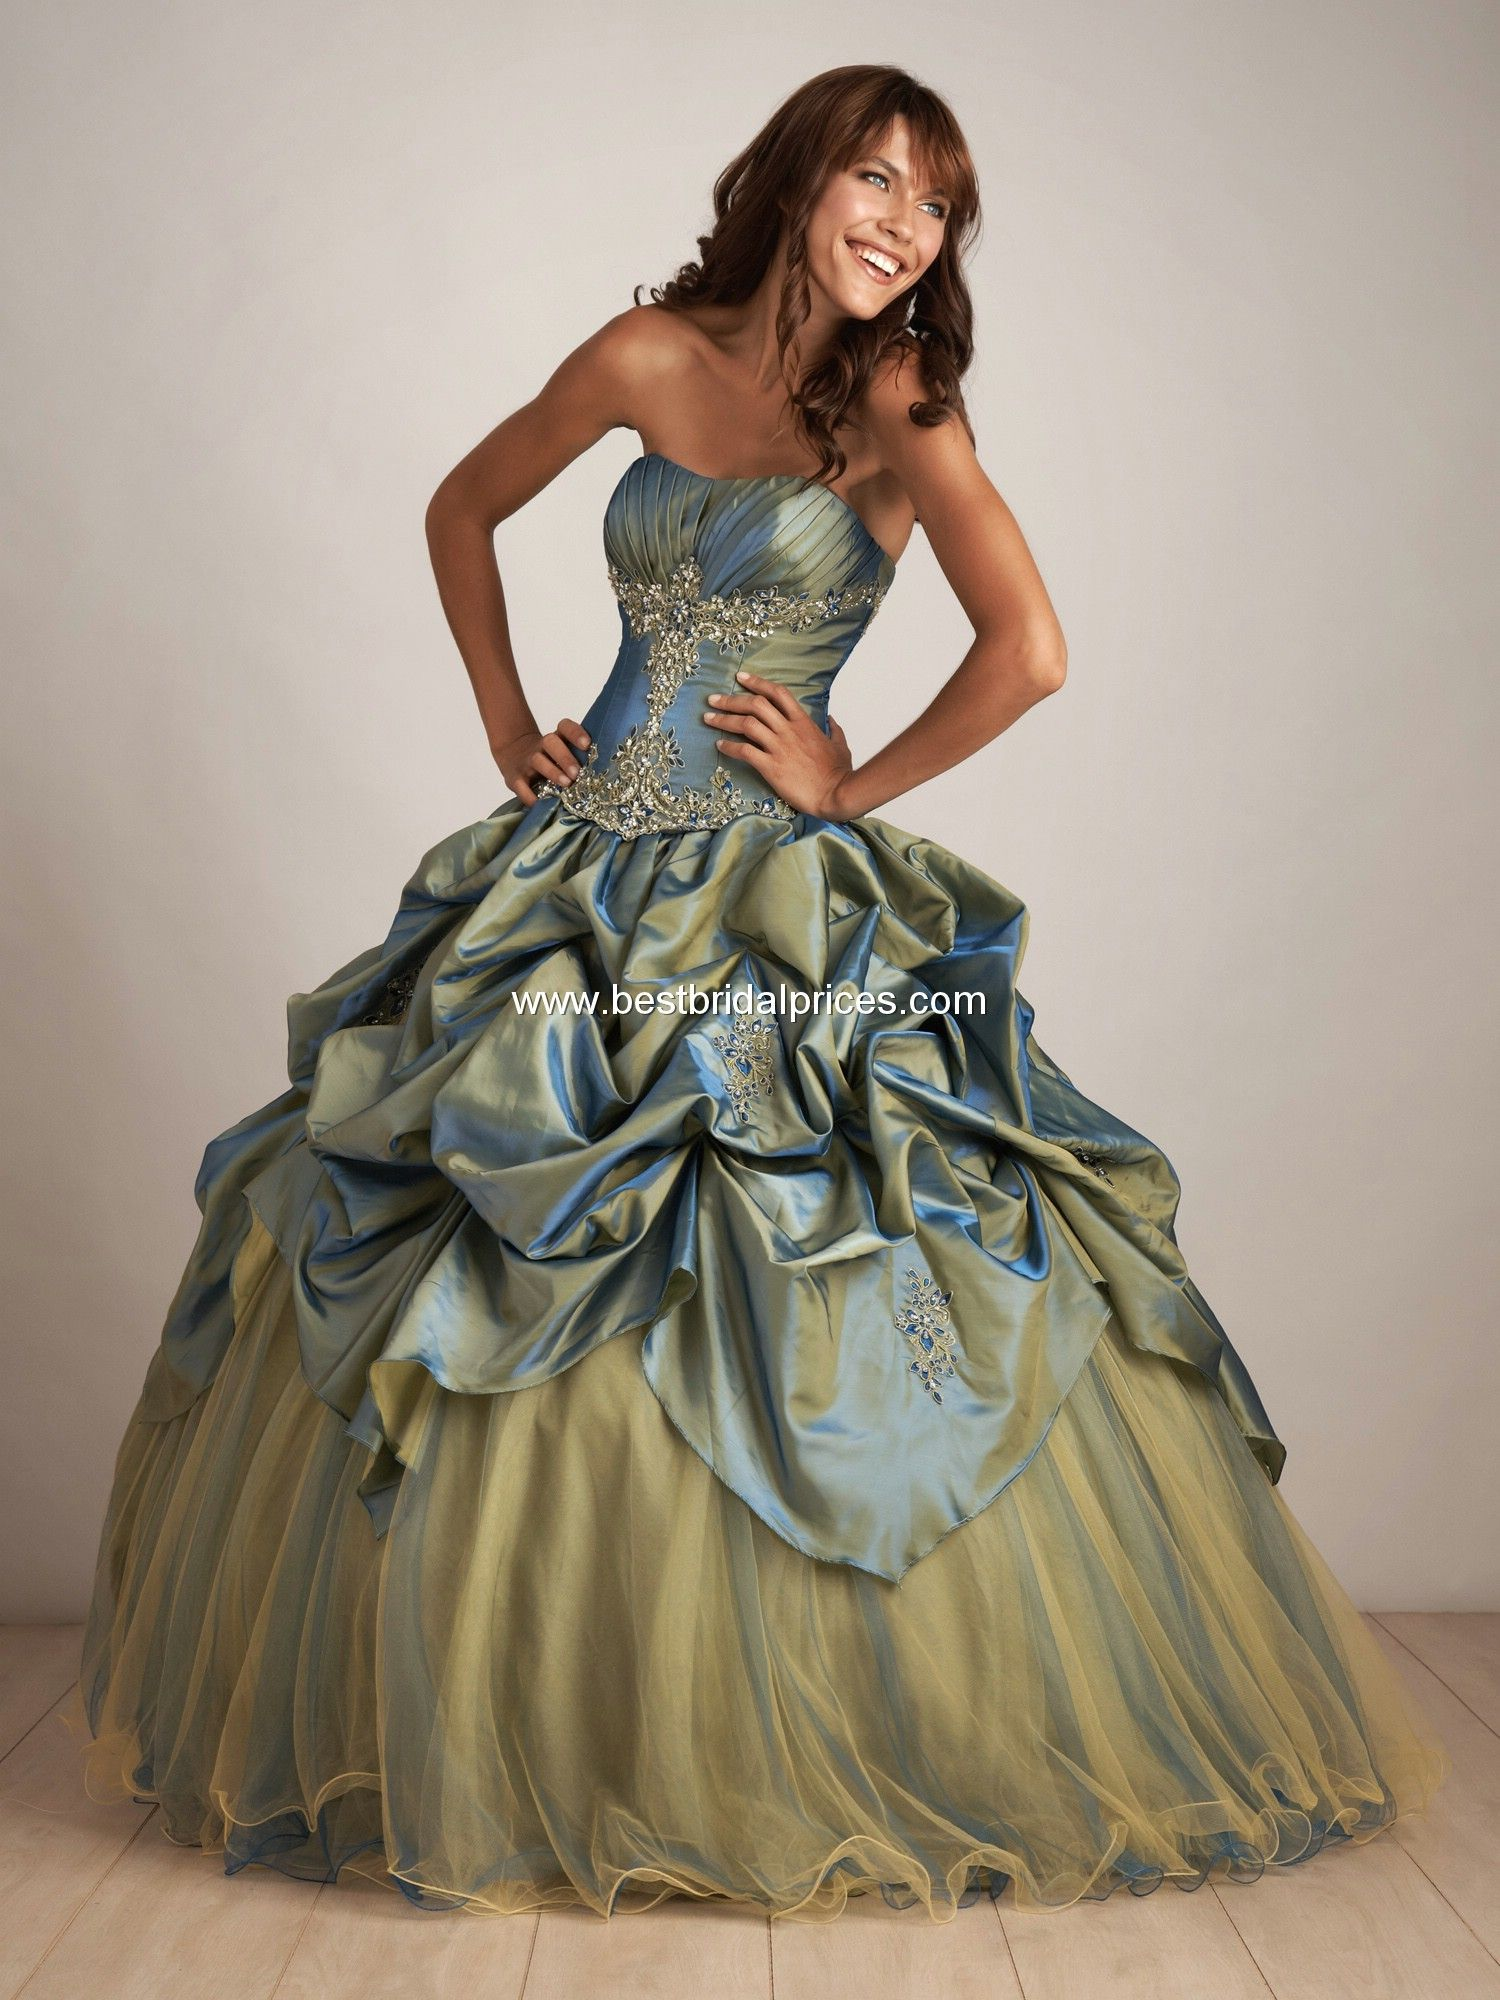 Allure Quinceanera Dresses - Style Q280 - Your Best Bridal Prices